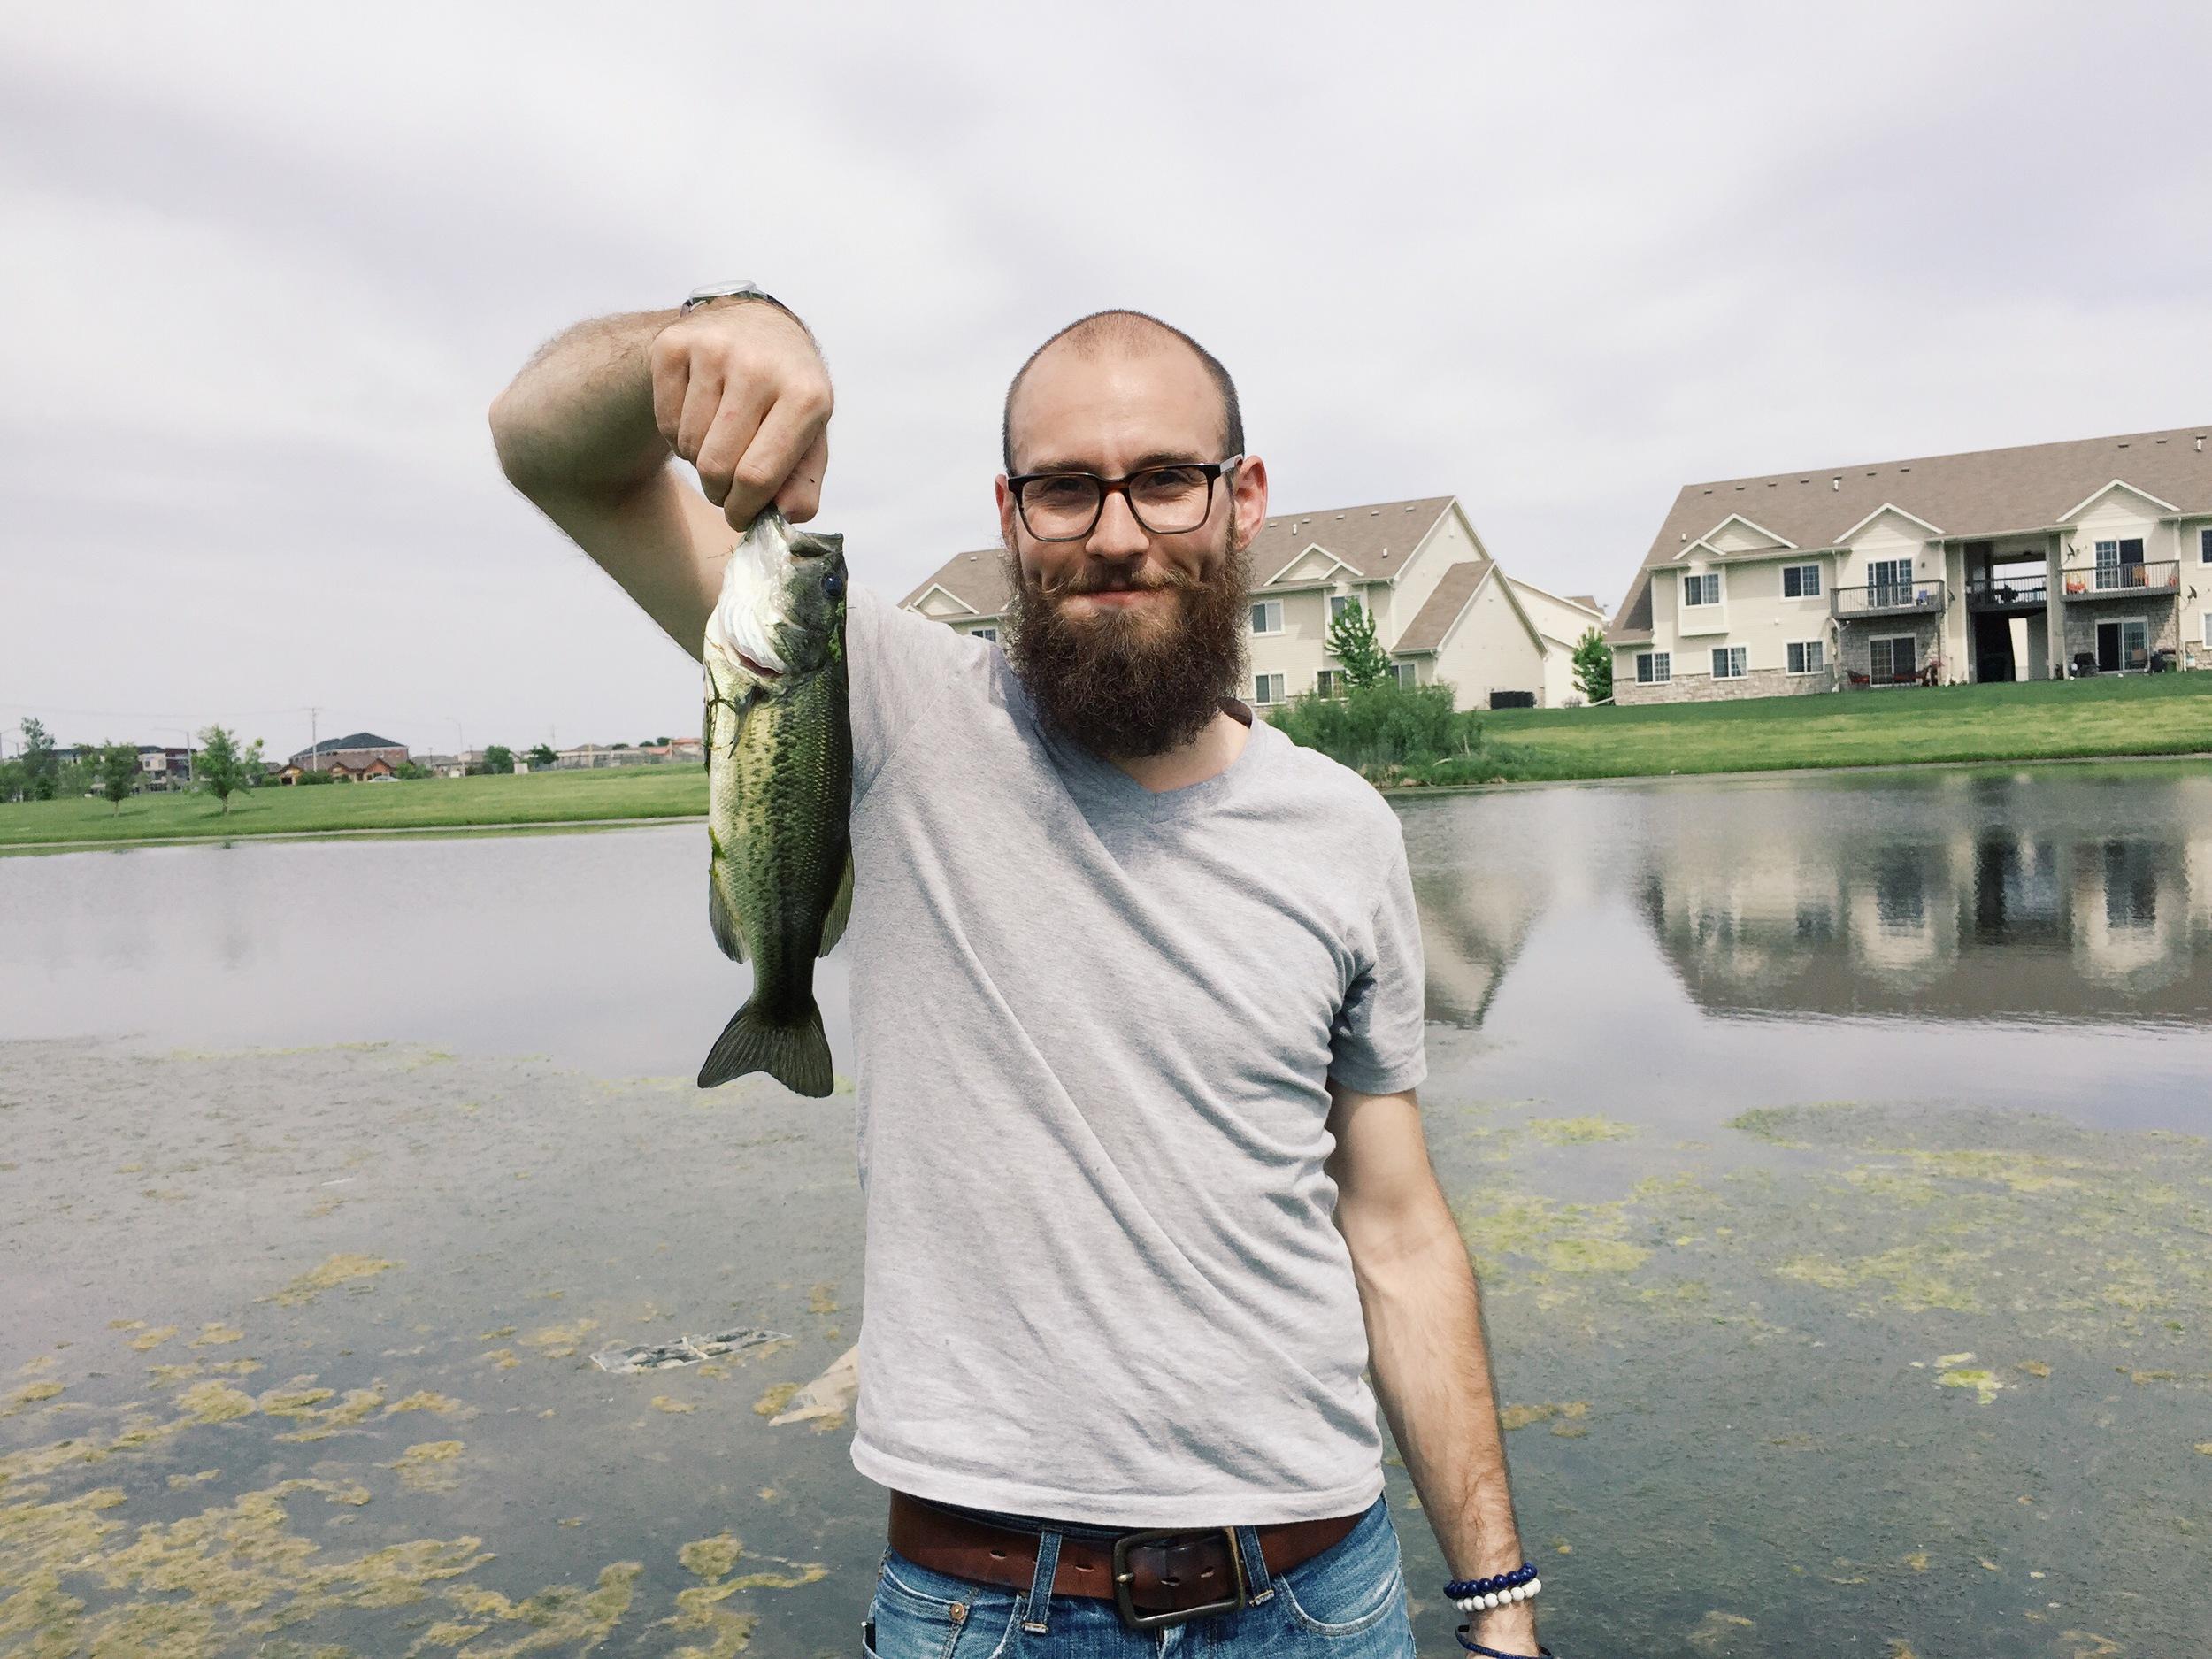 ankeny-fly-fishing-urban-bass-nathan